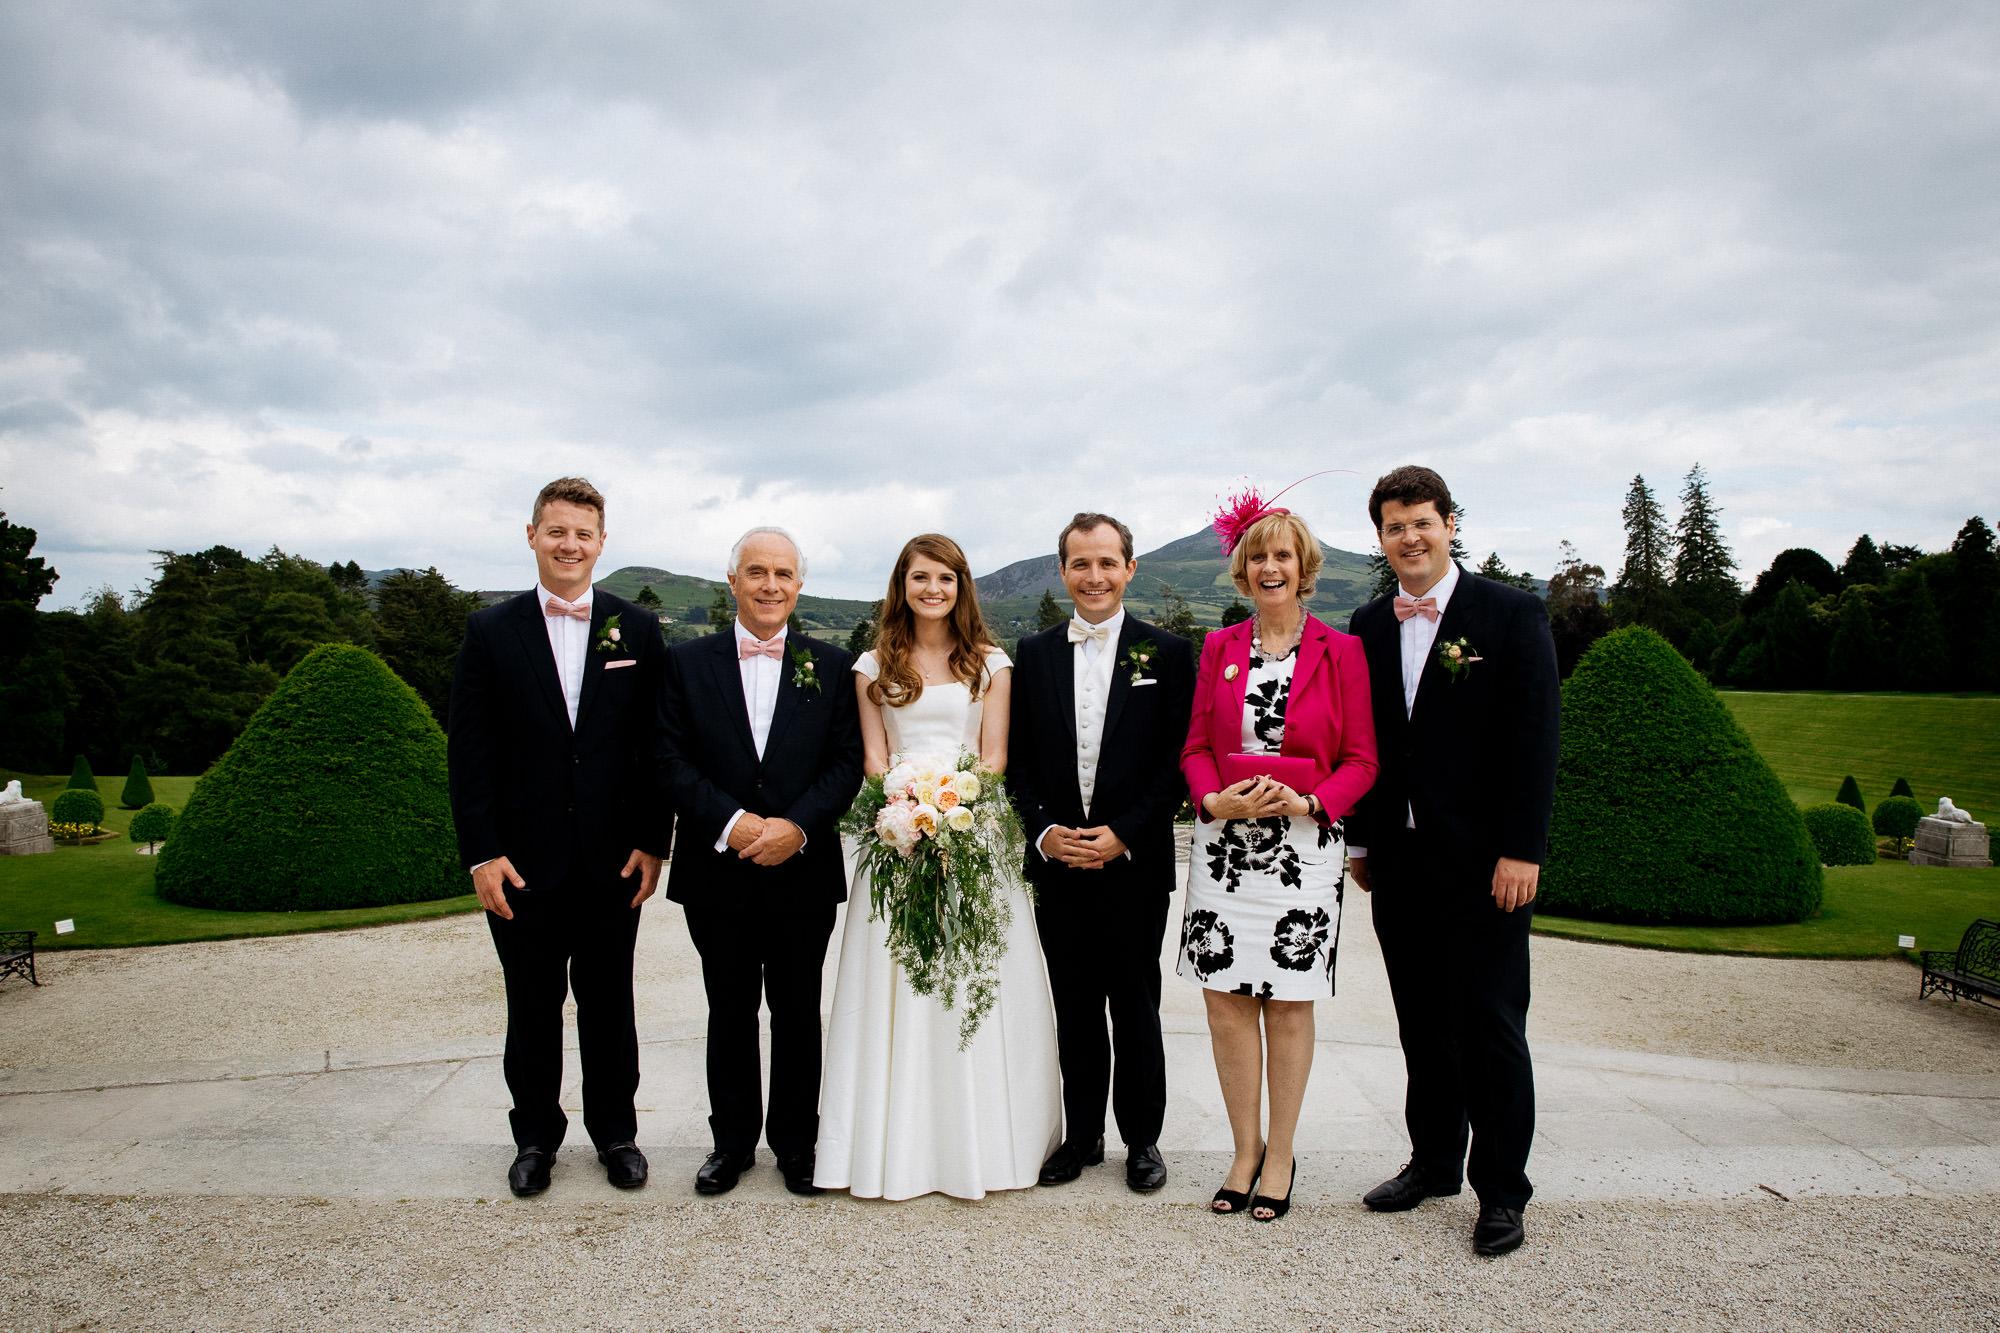 clairebyrnephotography-wedding-Emma-Max-13.jpg